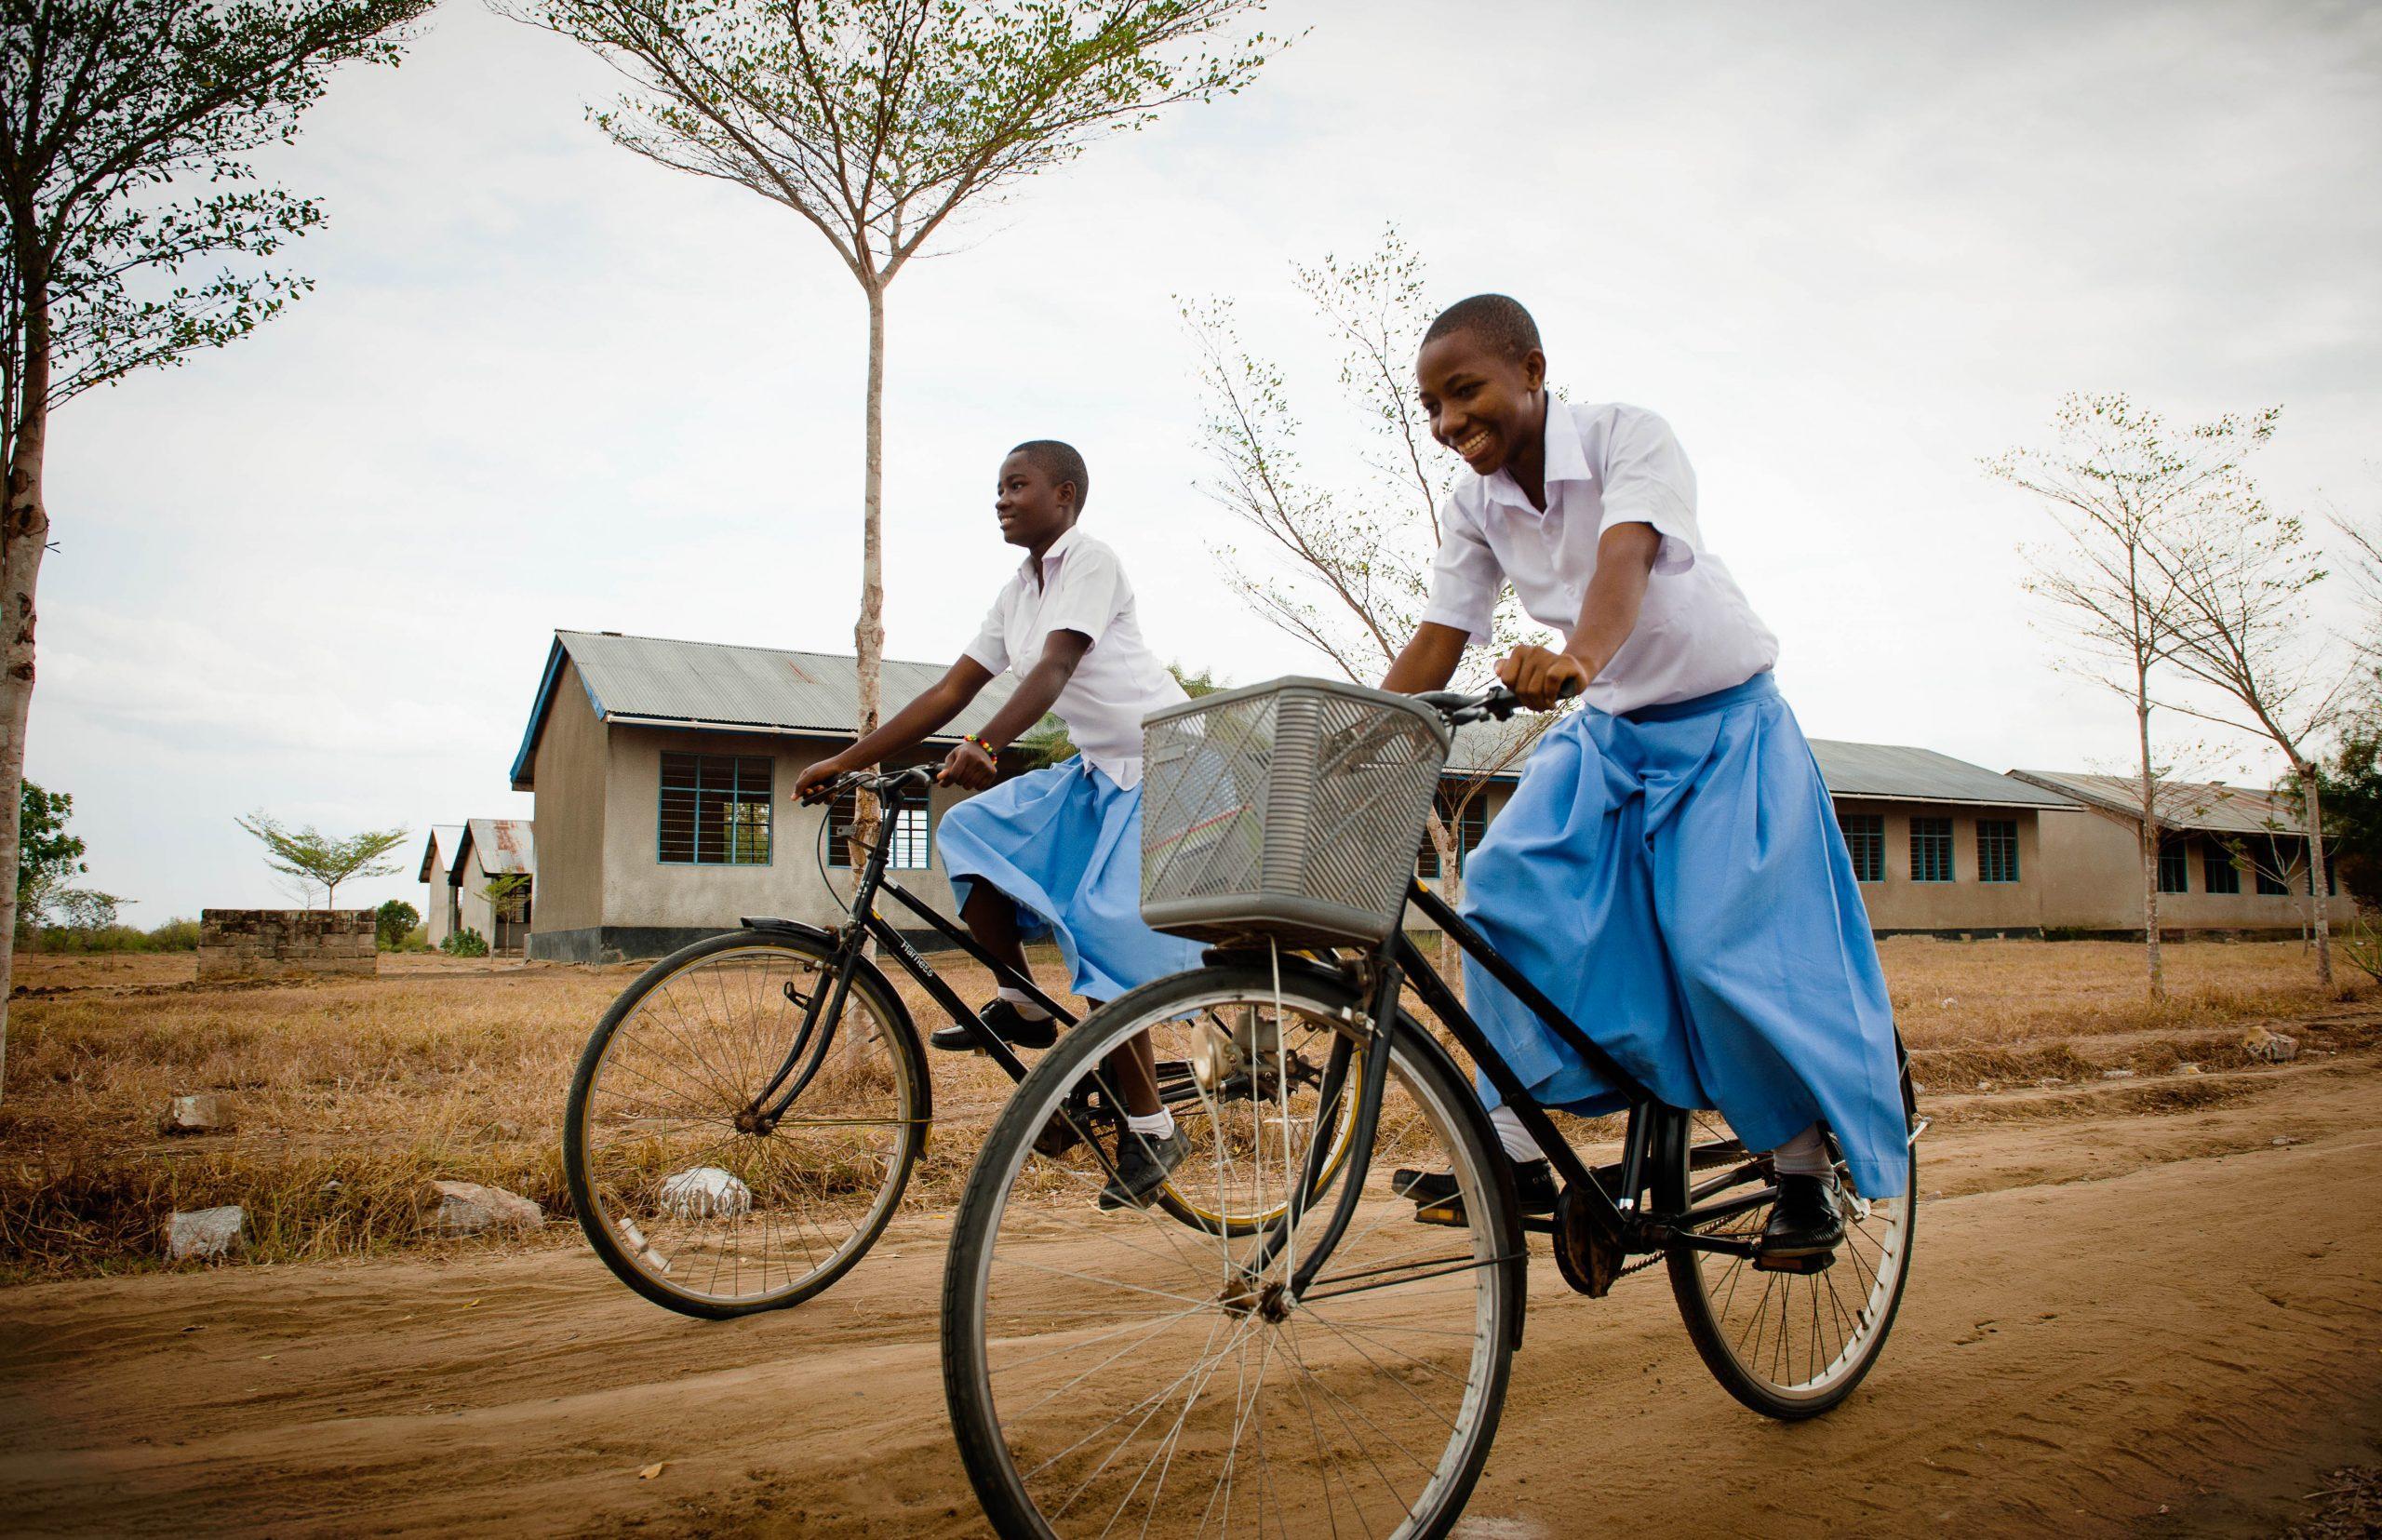 Bicycles-Camfed-scholars-Salima-and-Zawadi-Secondary-308004-Bibaha-TZ-22-Sep-2016-Eliza-Powell-DSC_2790.jpg